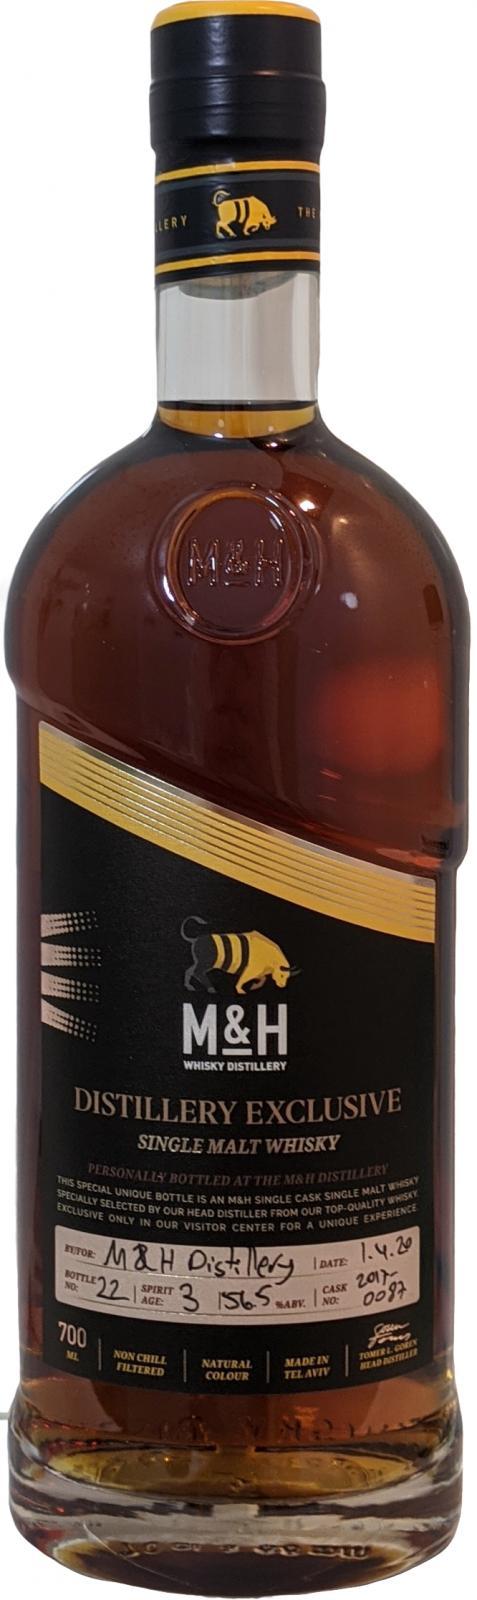 Milk & Honey 03-year-old